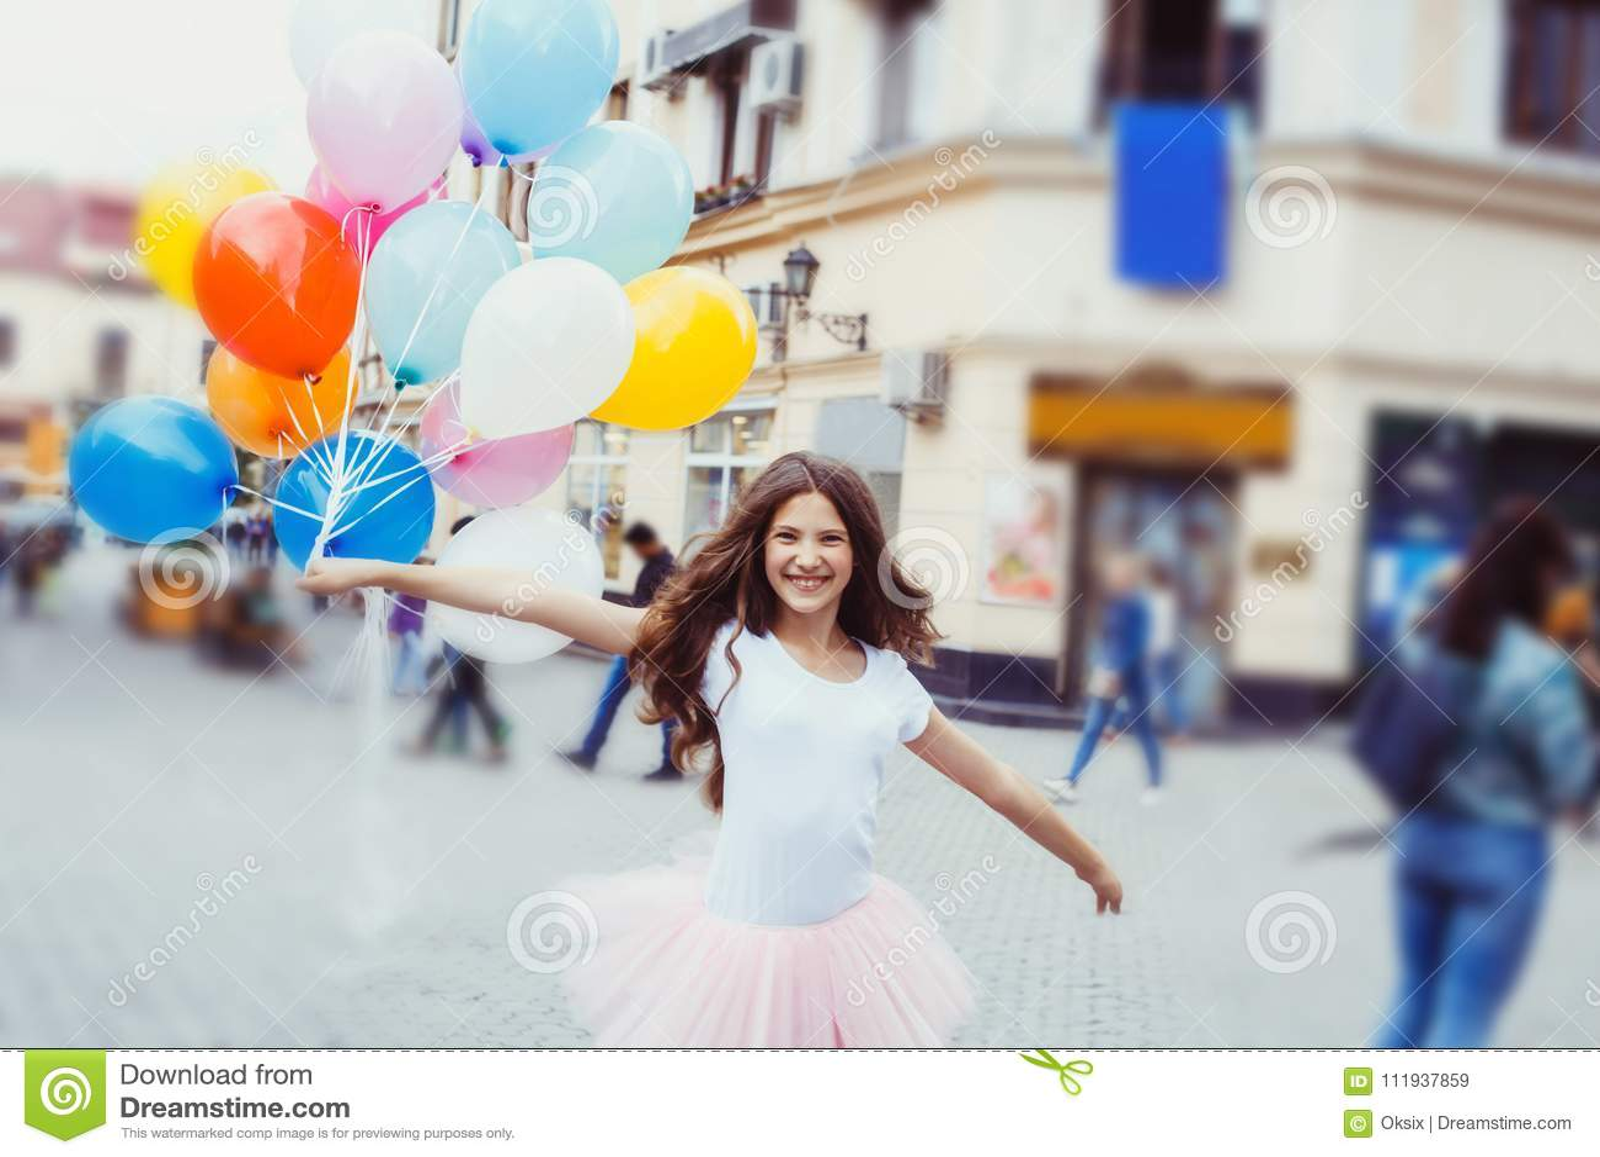 Happy Birthday Teenager Girl Stock Image Image of birthday